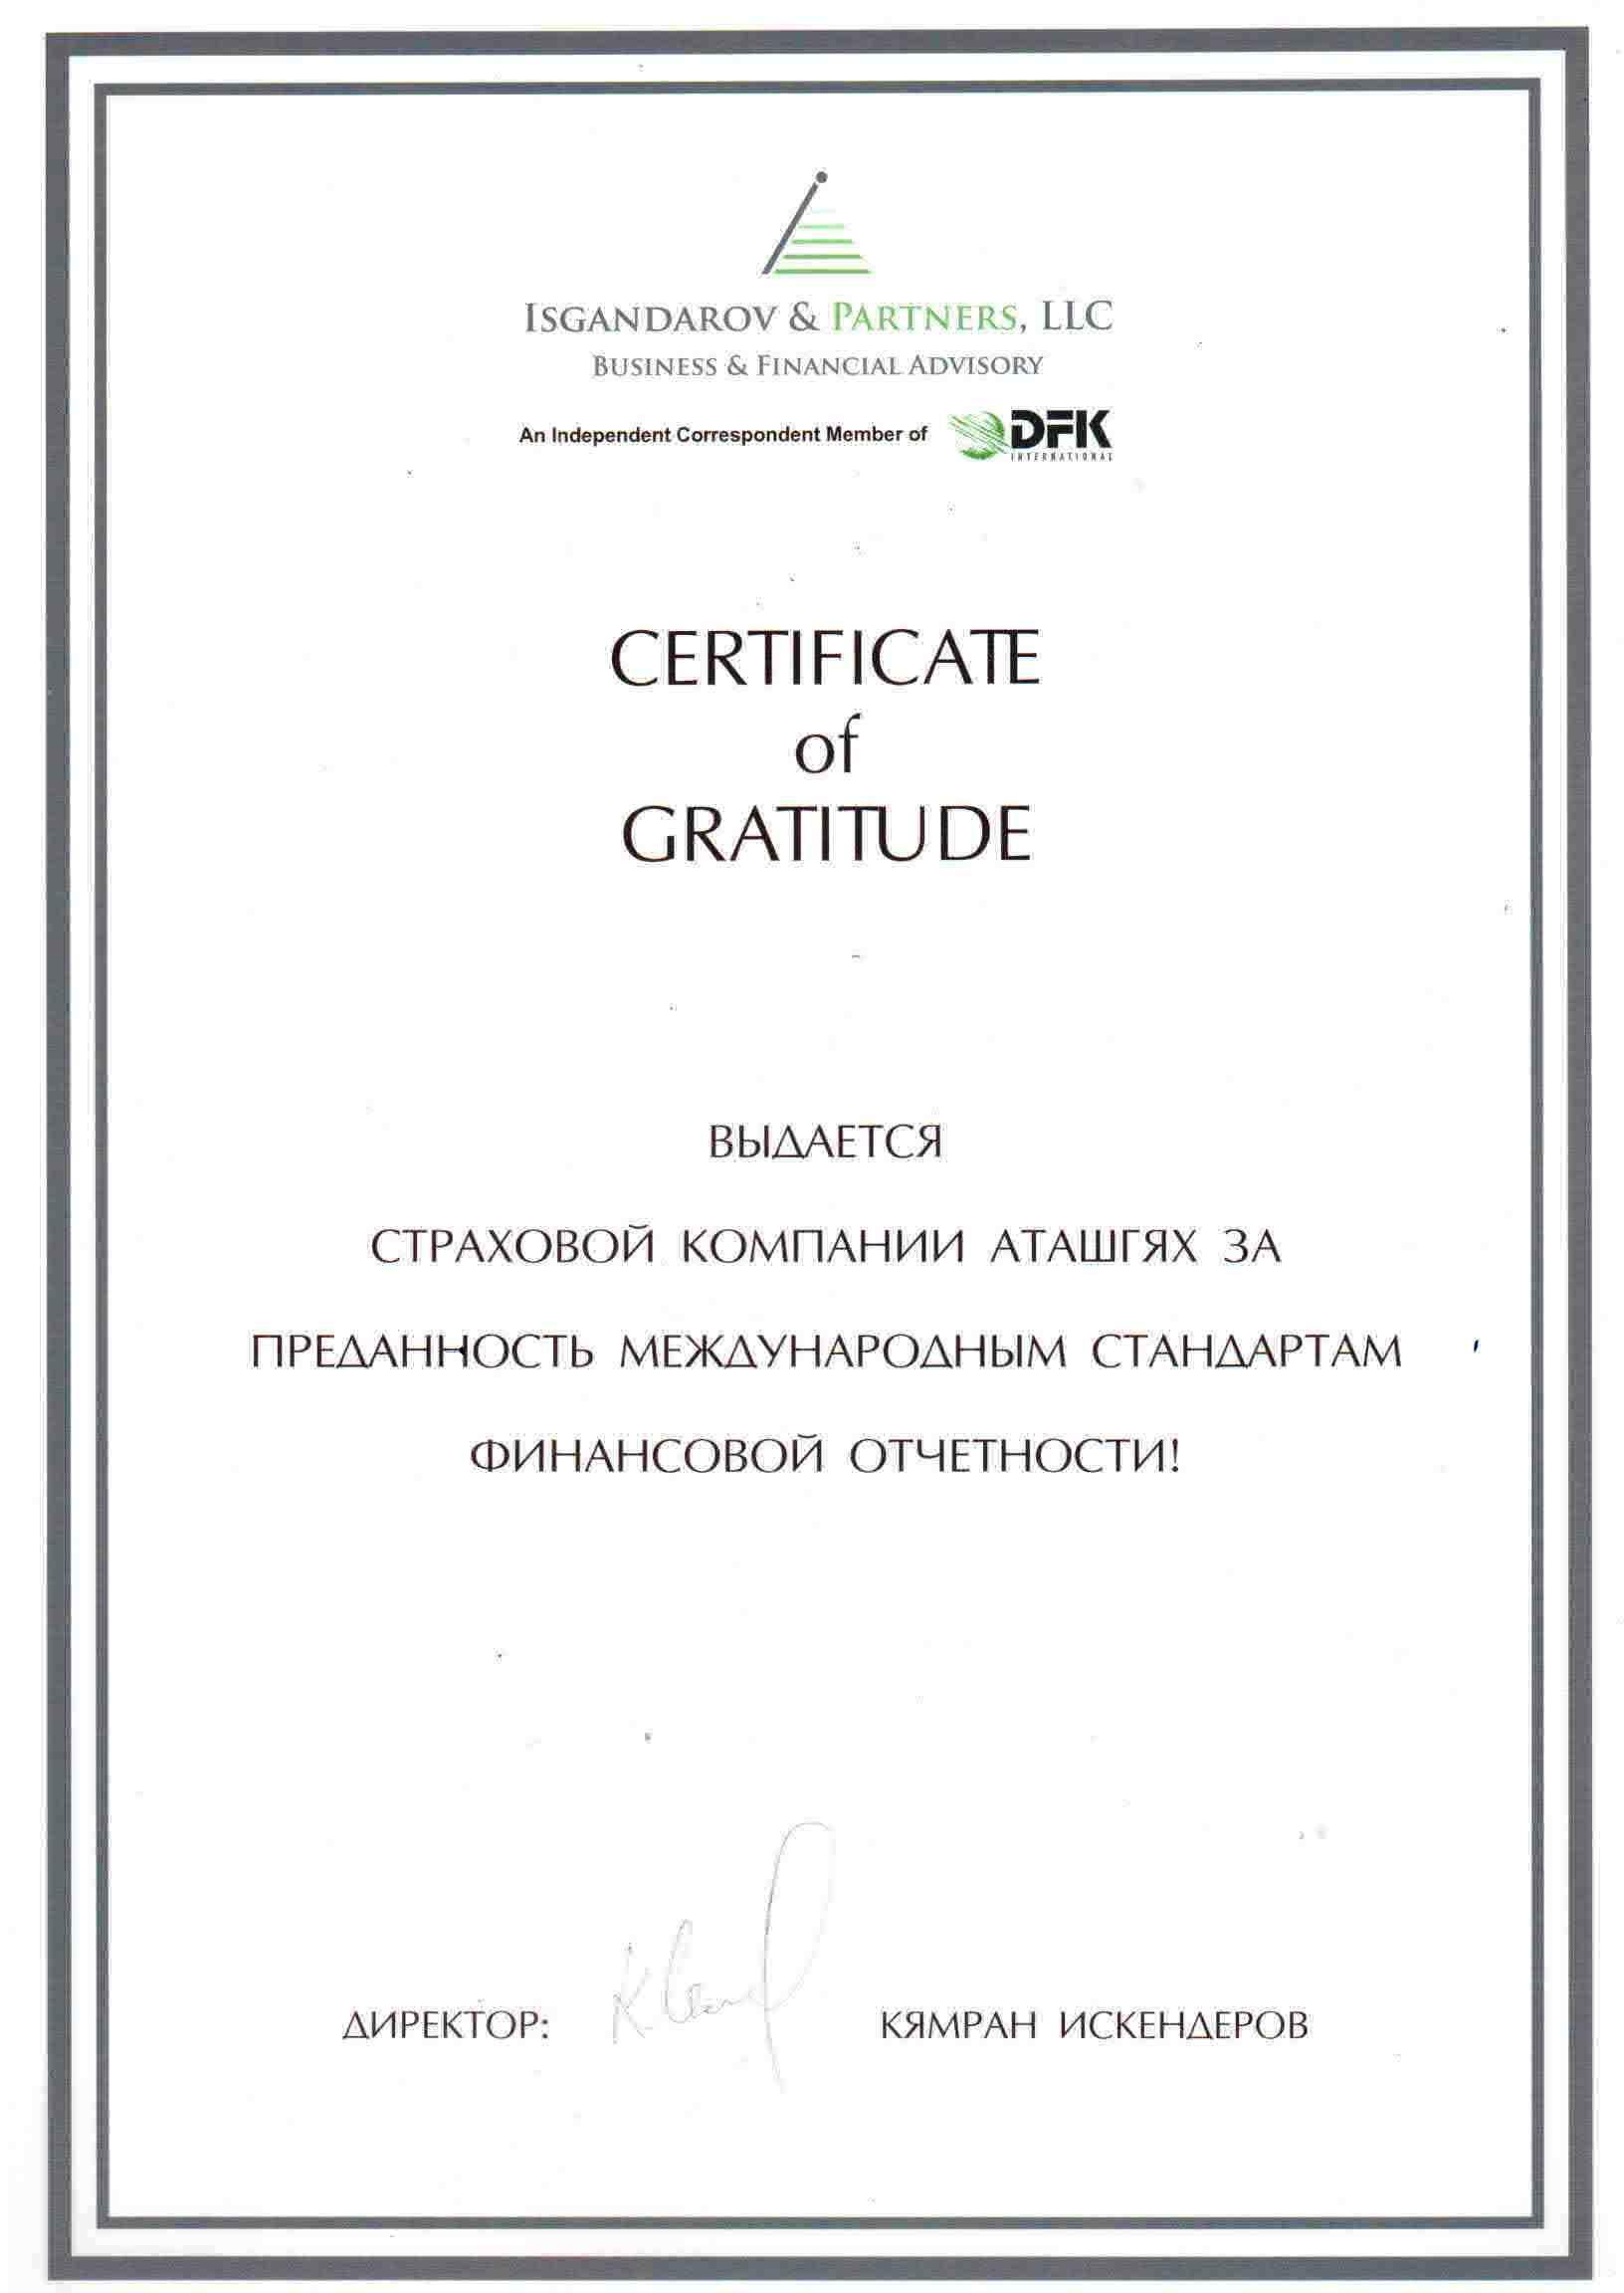 Certificate of Gratitude